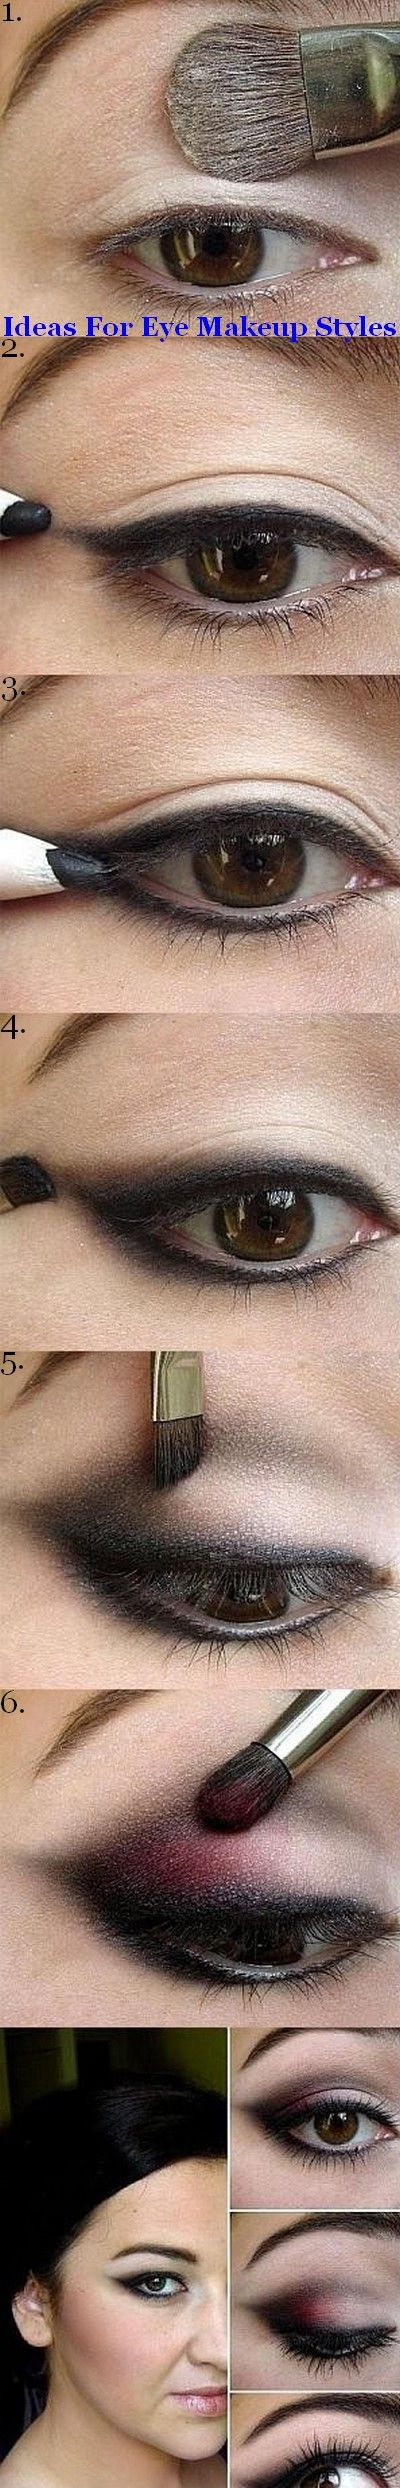 best make up images on pinterest beauty makeup maquiagem and